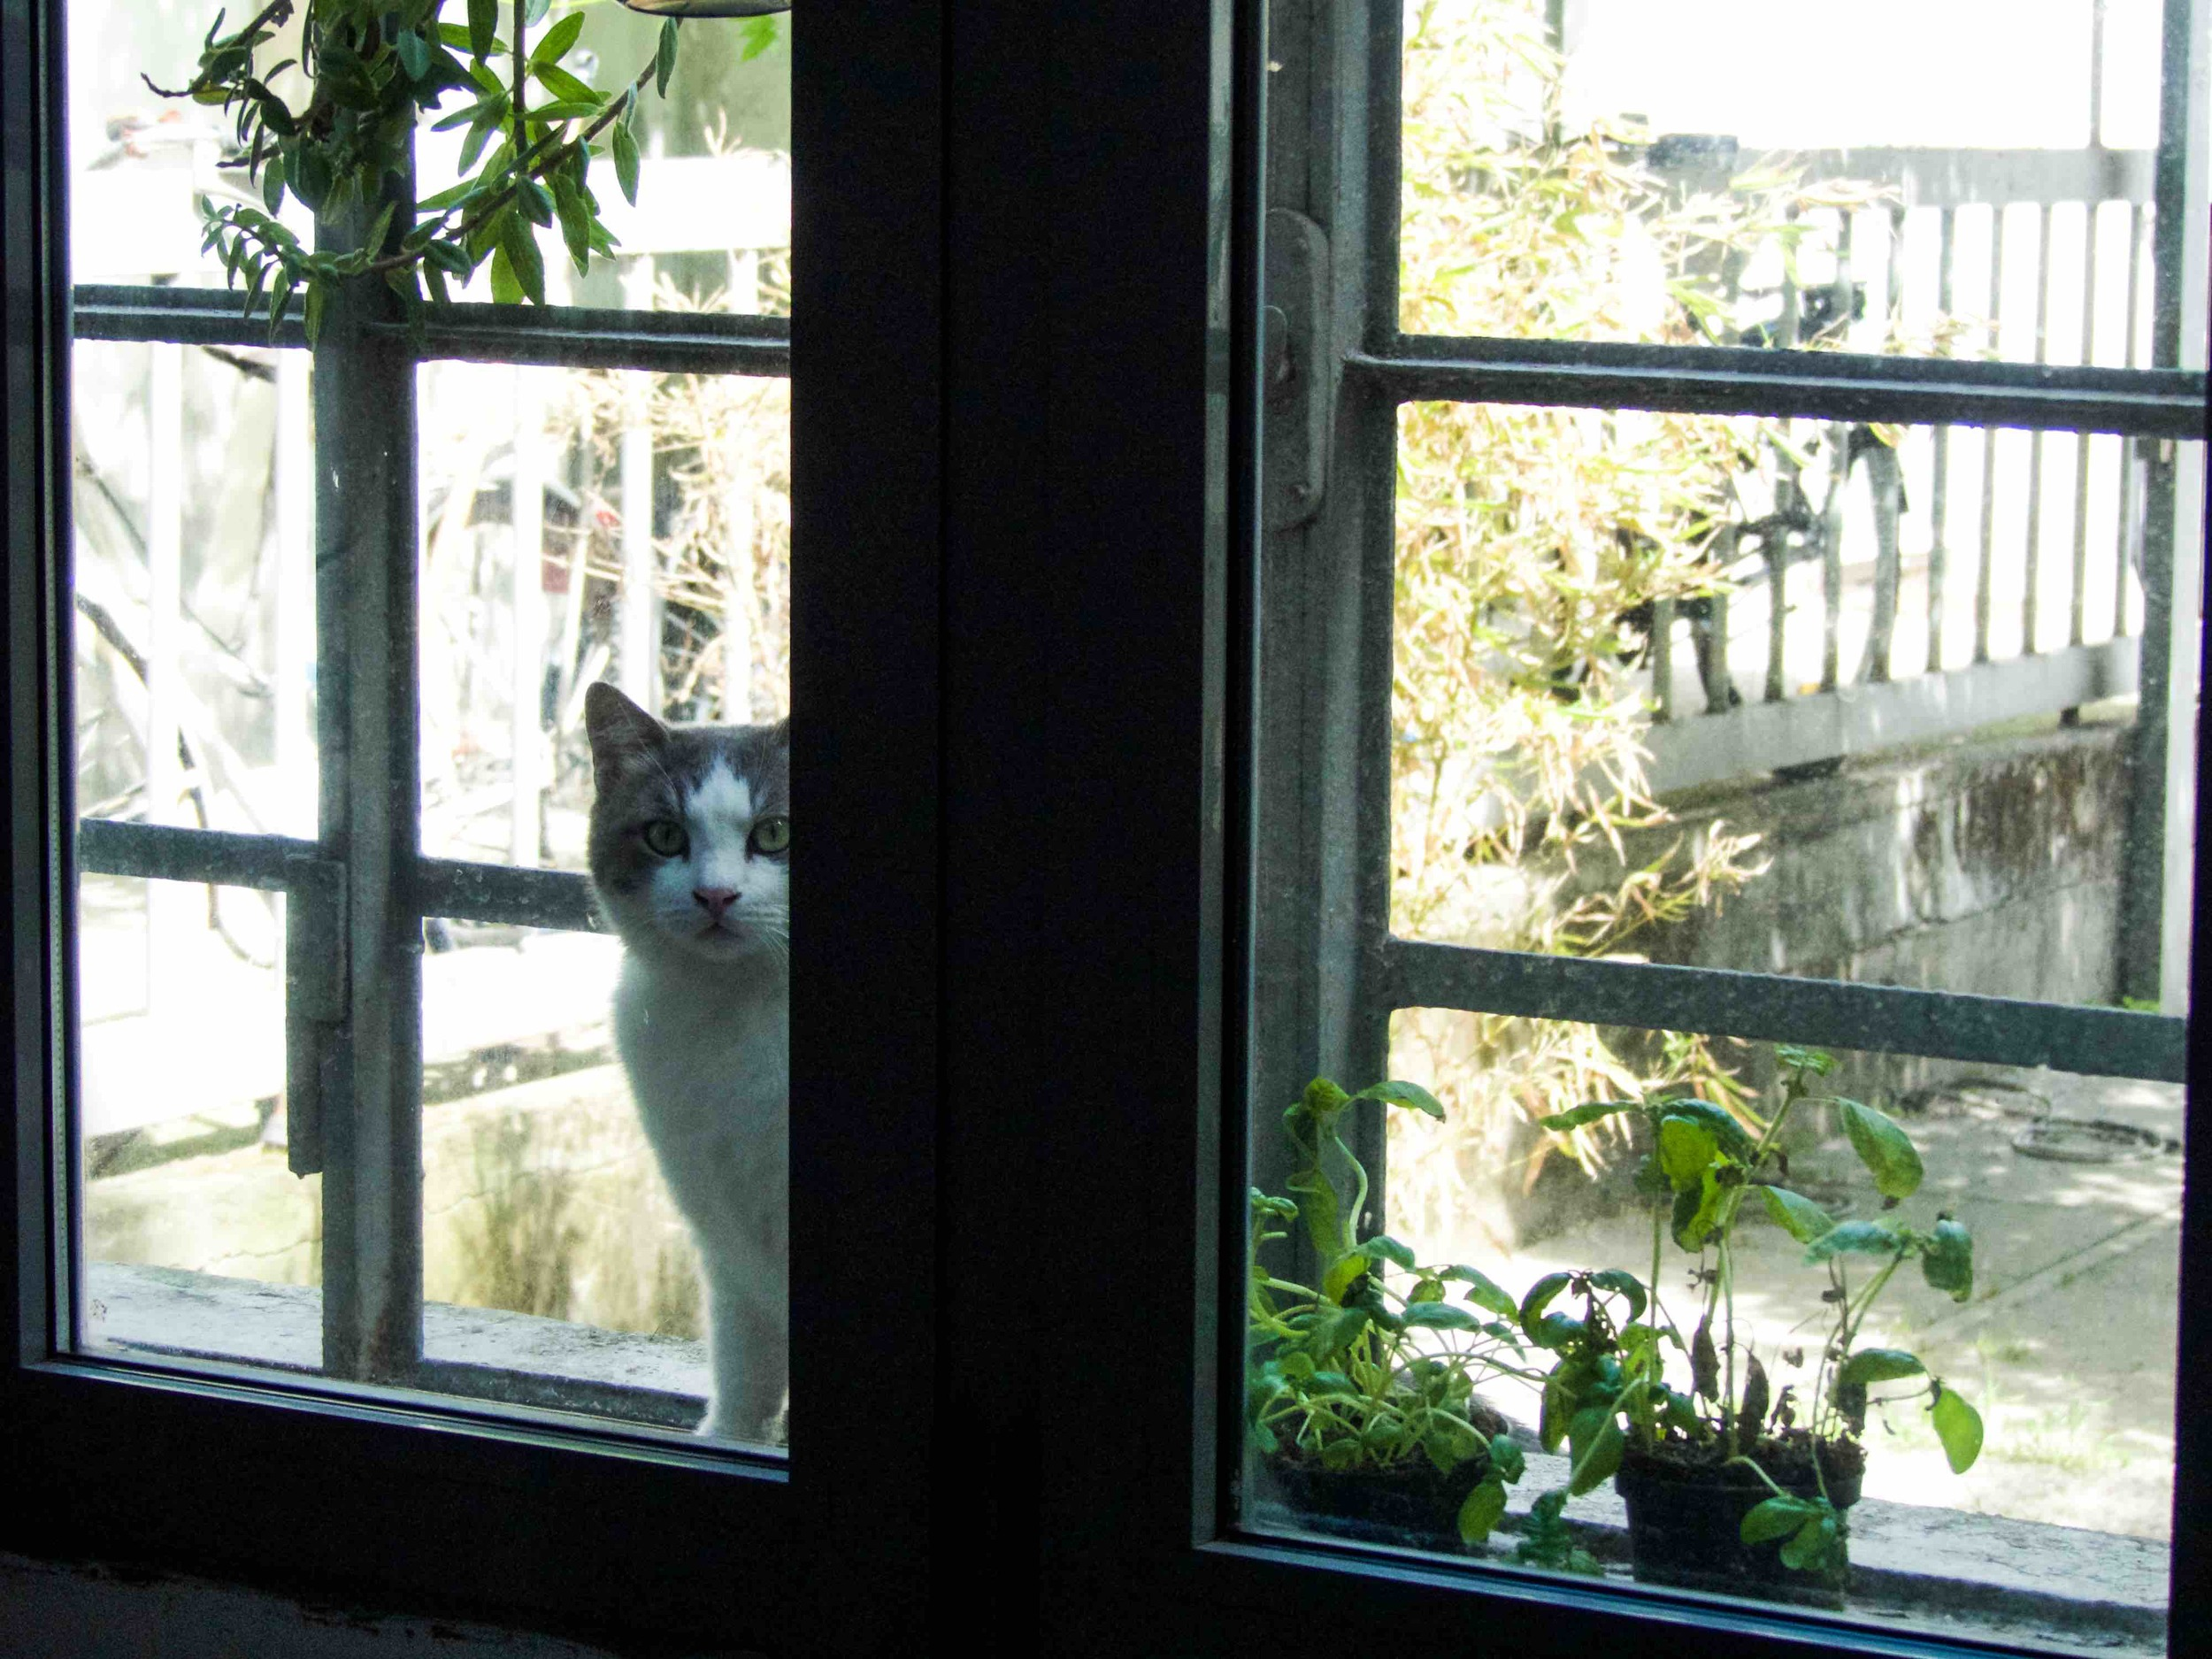 My food inspector - Pierino the cat